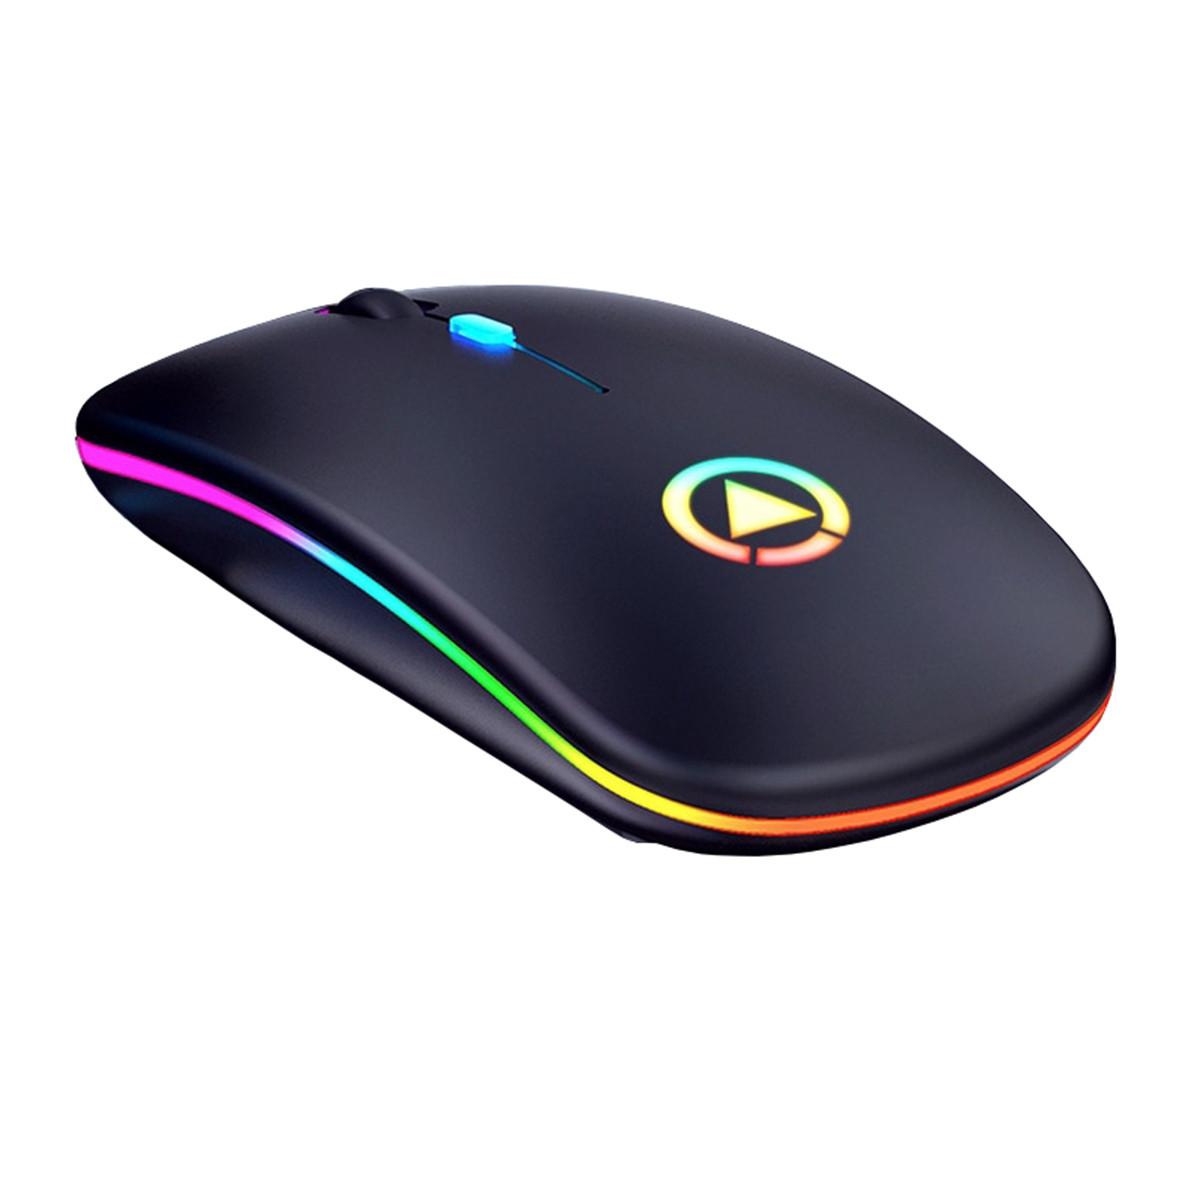 Миша бездротова SKY (A2-BT) Black, акумулятор, Bluetooth, RGB